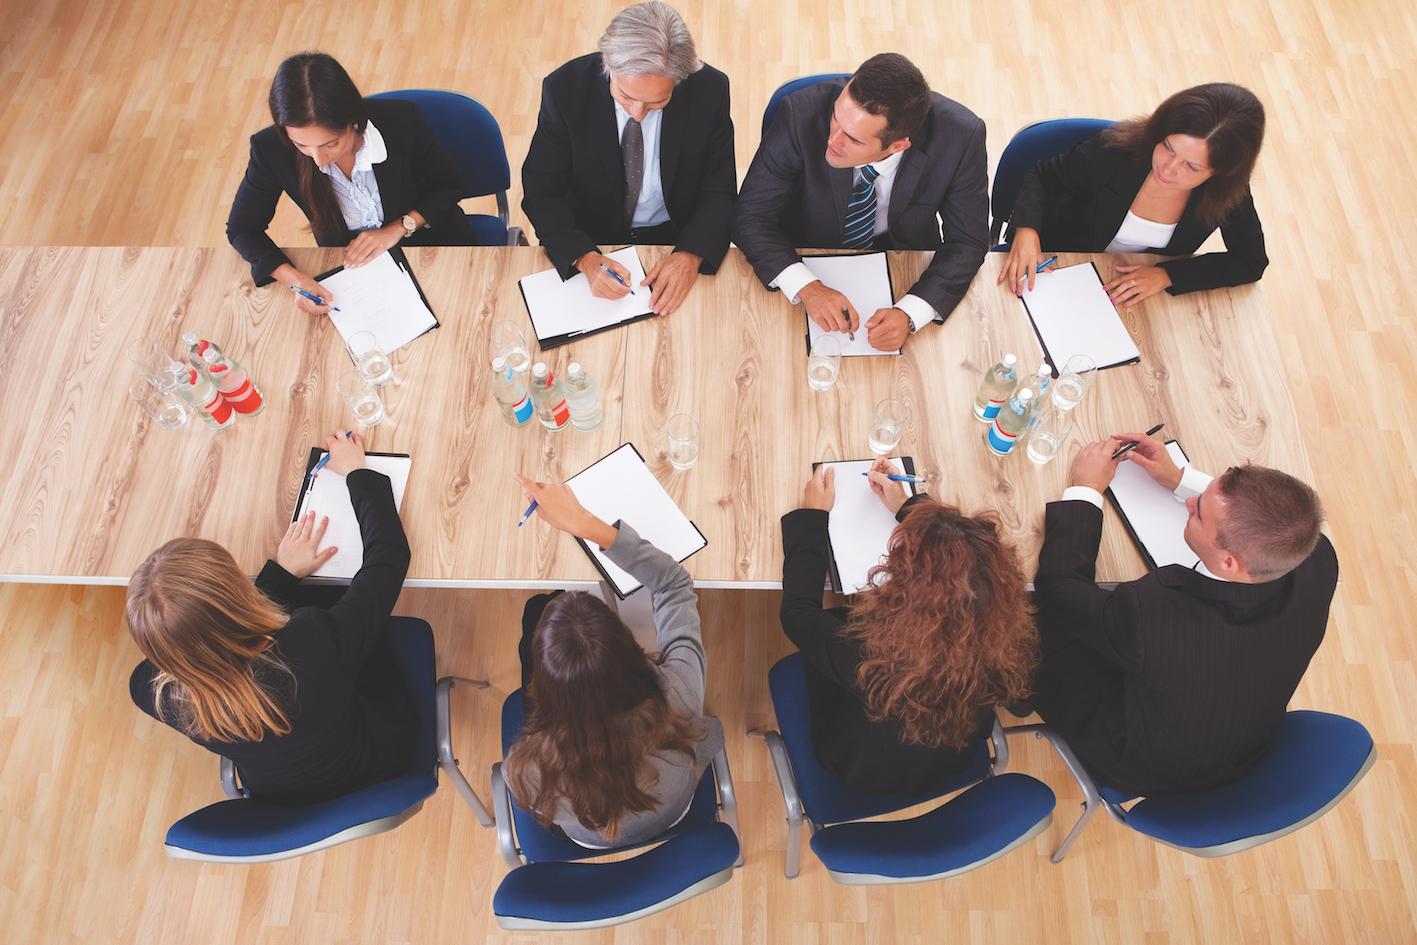 Herr Business people in a meeting